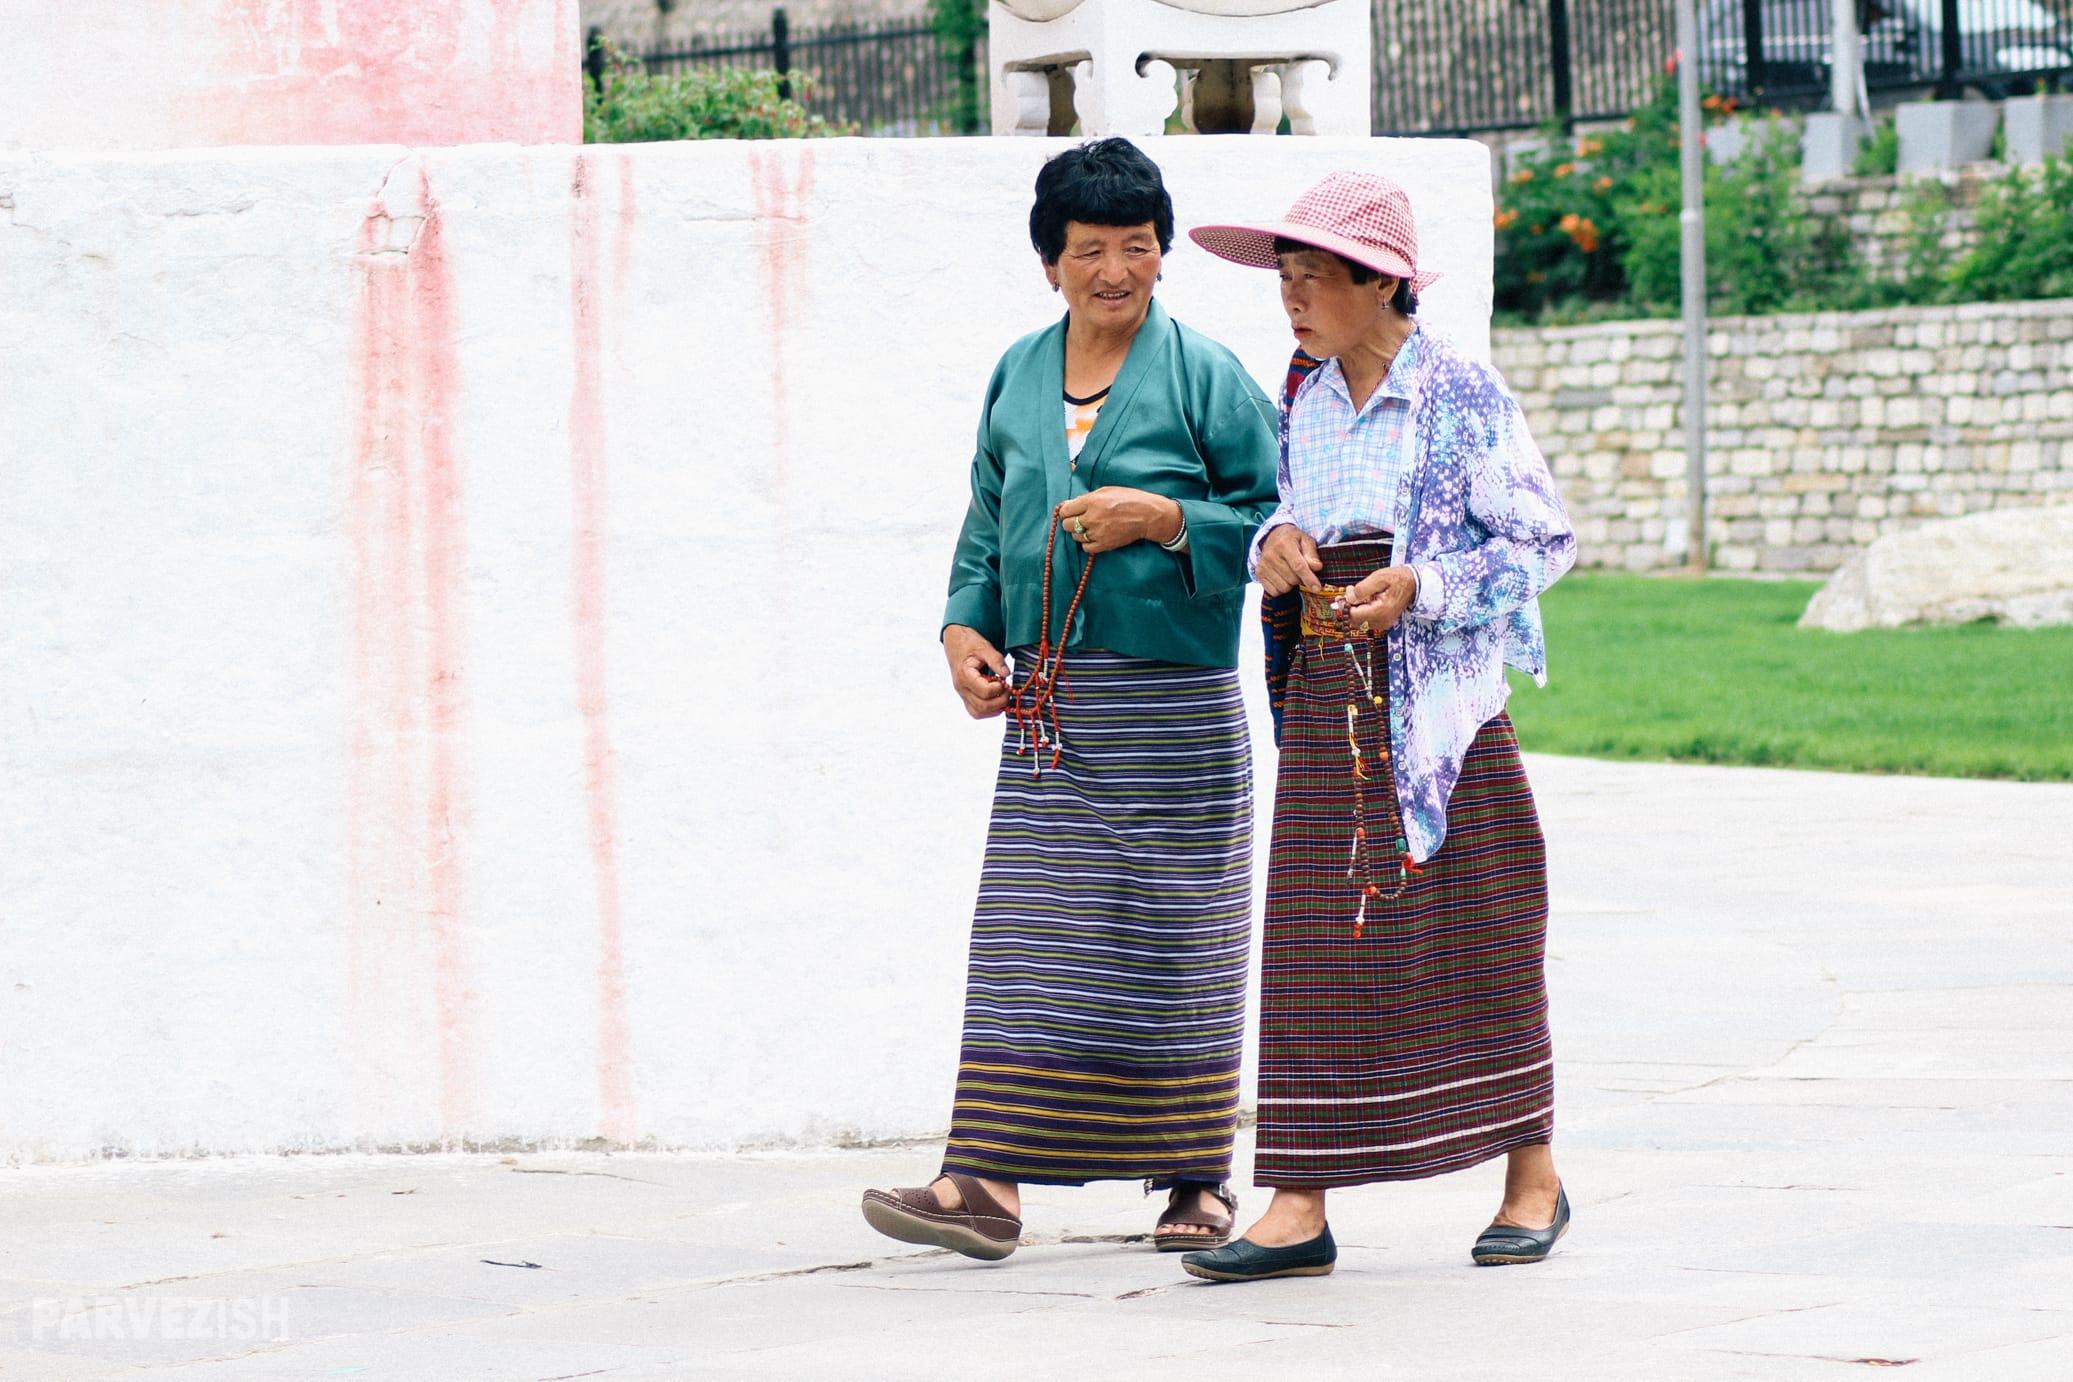 Two Women Circumambulating at Memorial Chorten Thimpu Bhutan